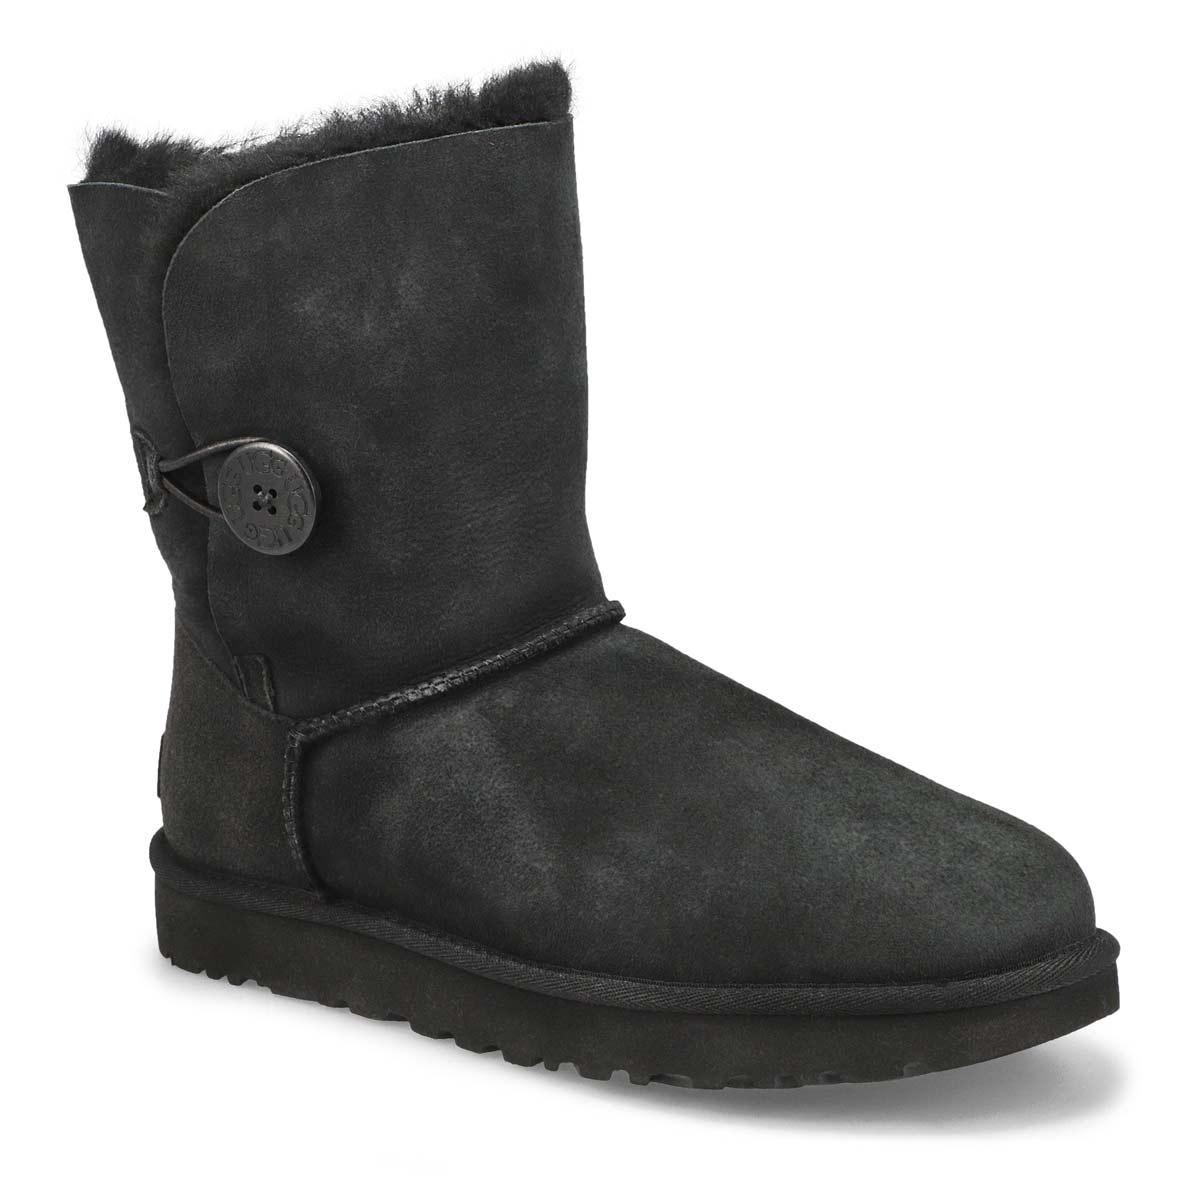 Women's Bailey Button II Sheepskin Boot - Black